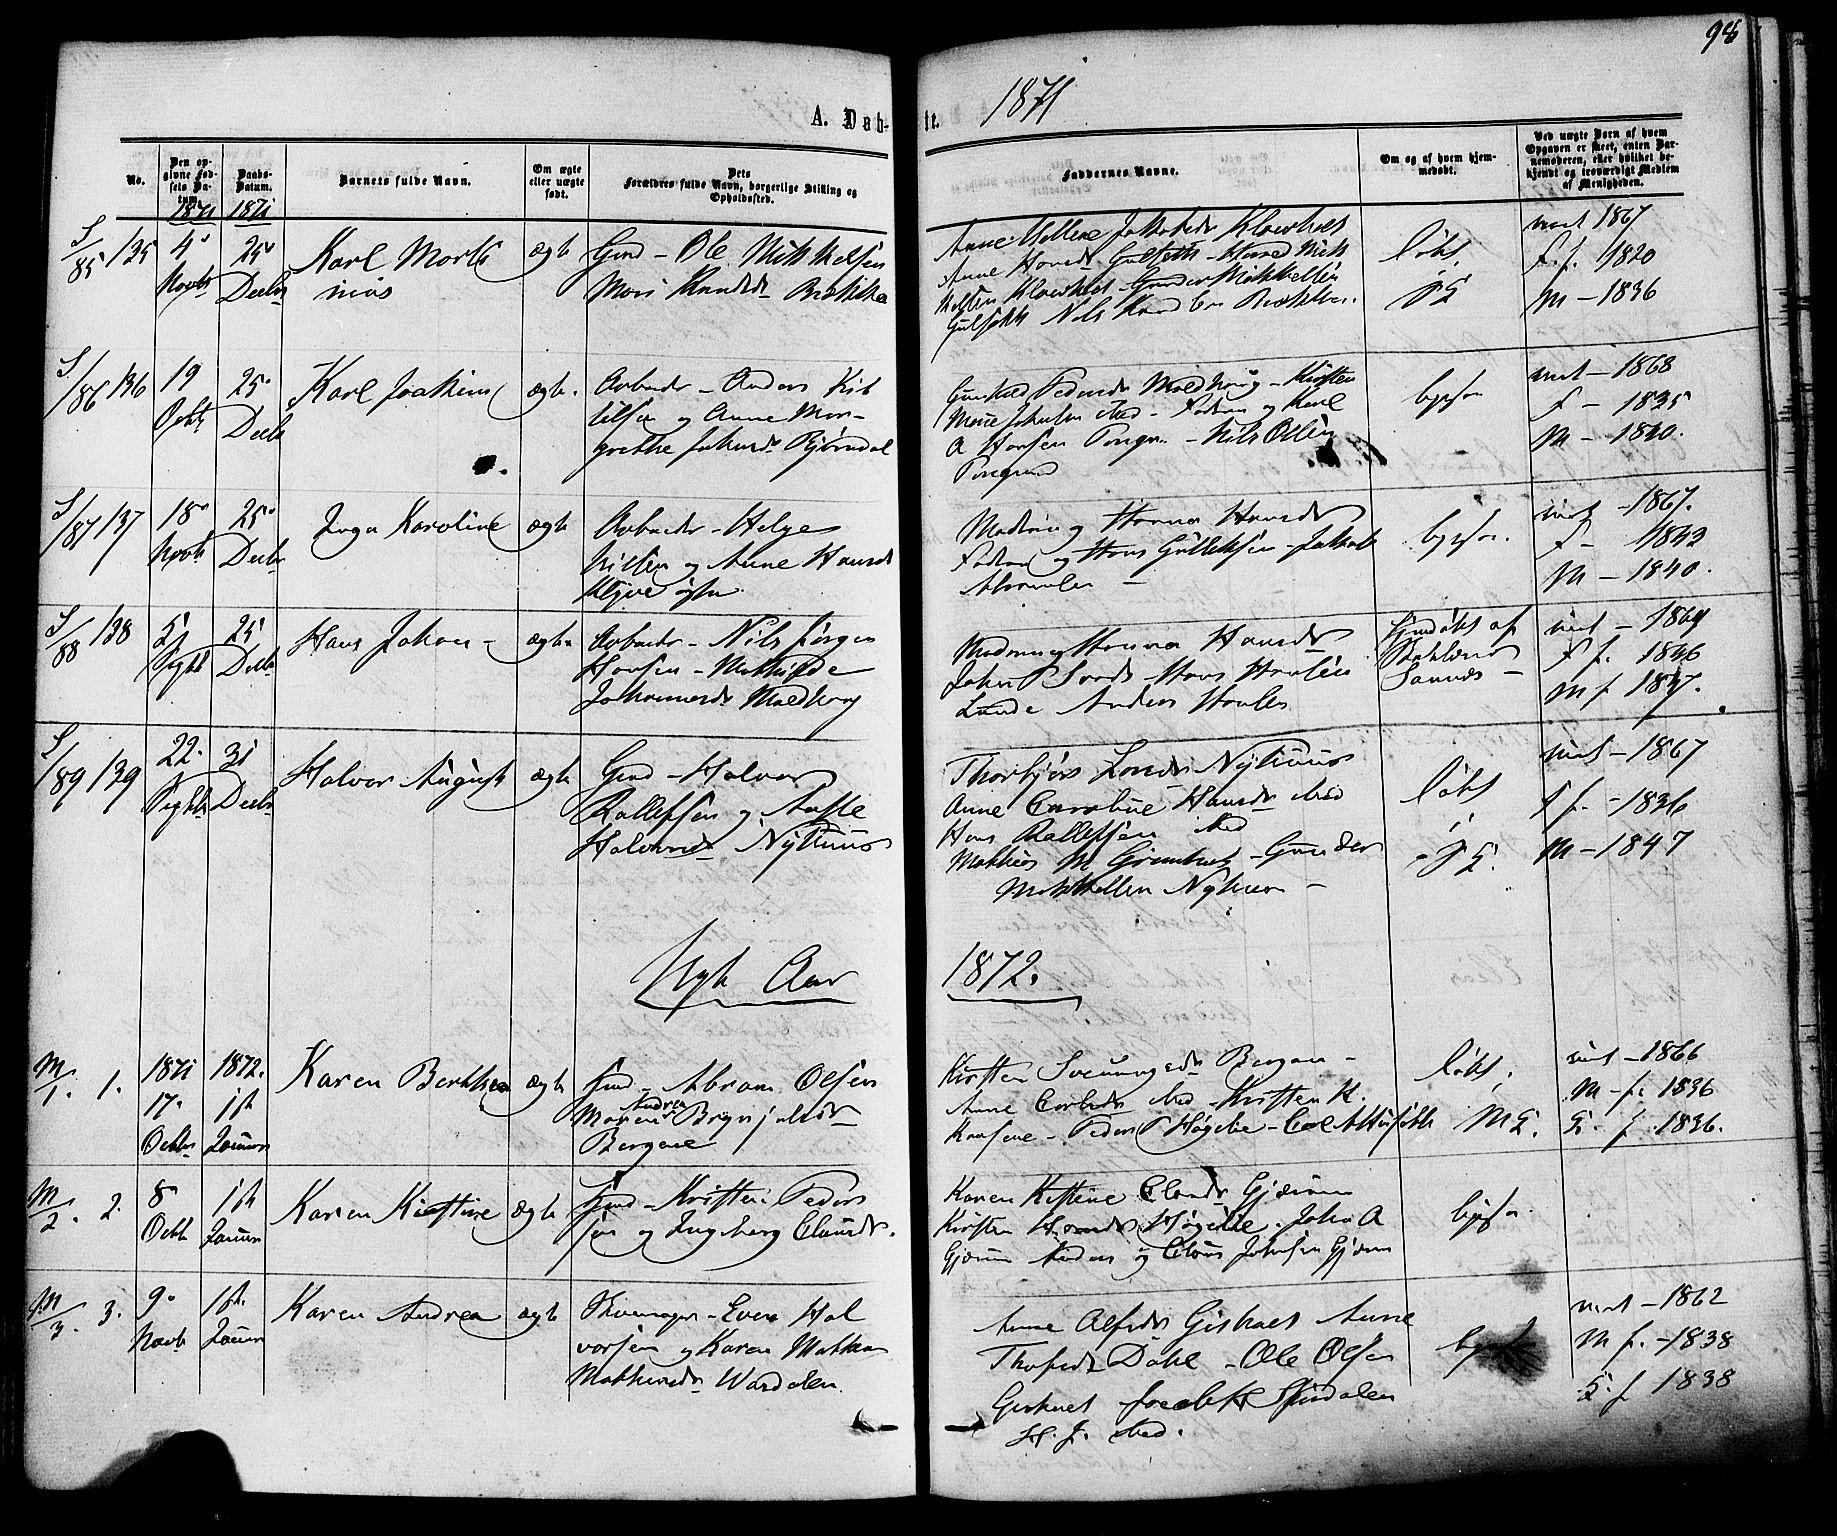 SAKO, Solum kirkebøker, F/Fa/L0008: Ministerialbok nr. I 8, 1865-1876, s. 98